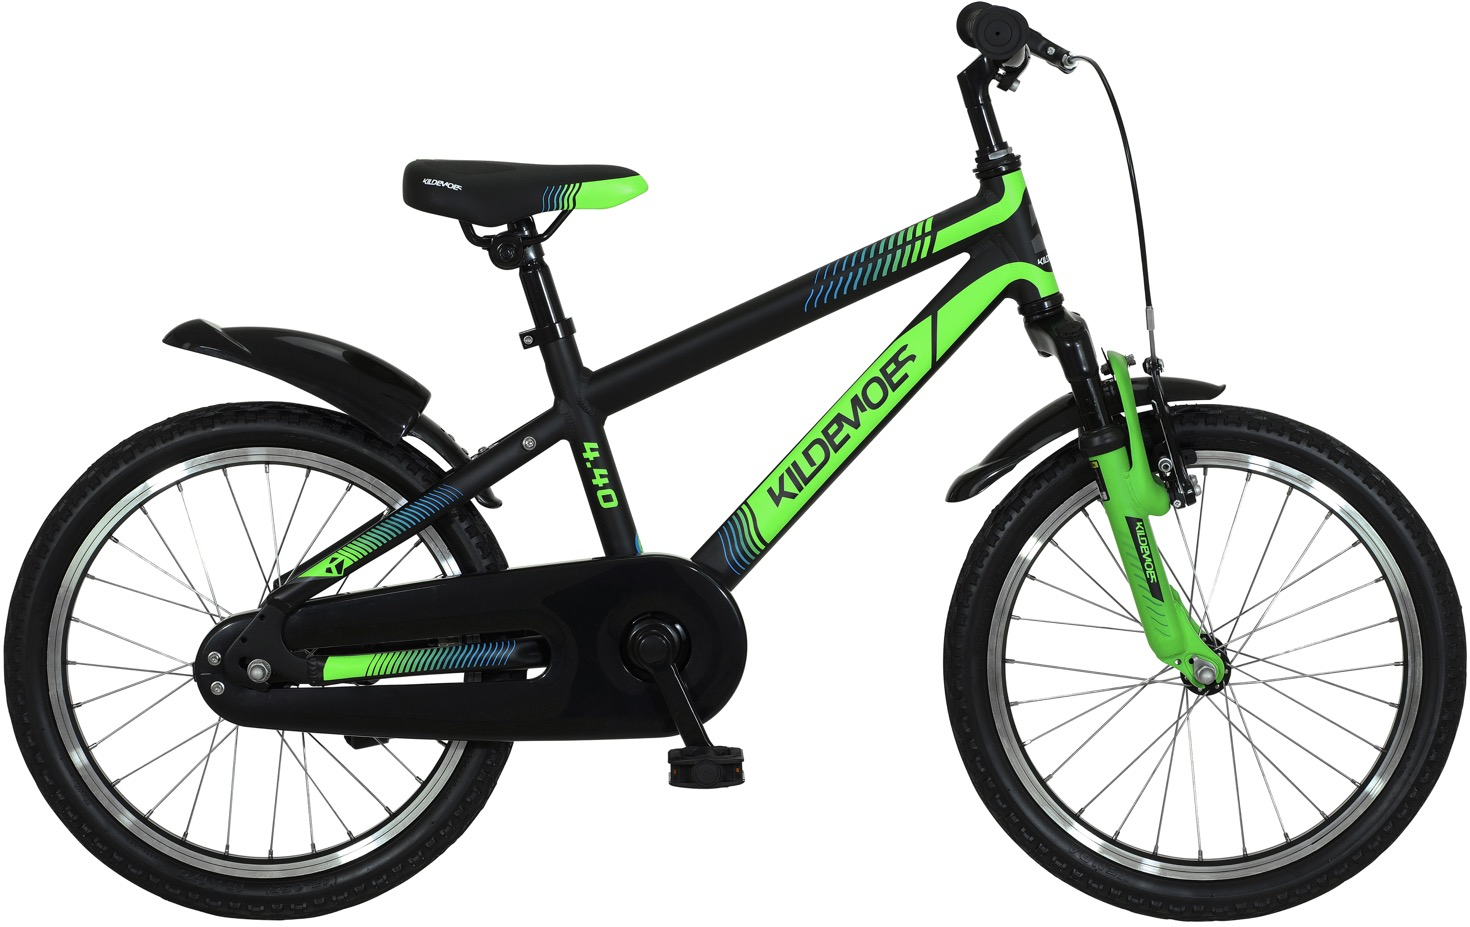 "Kildemoes Bikerz Dreng 16"" Soft Black W. Green - 2020"